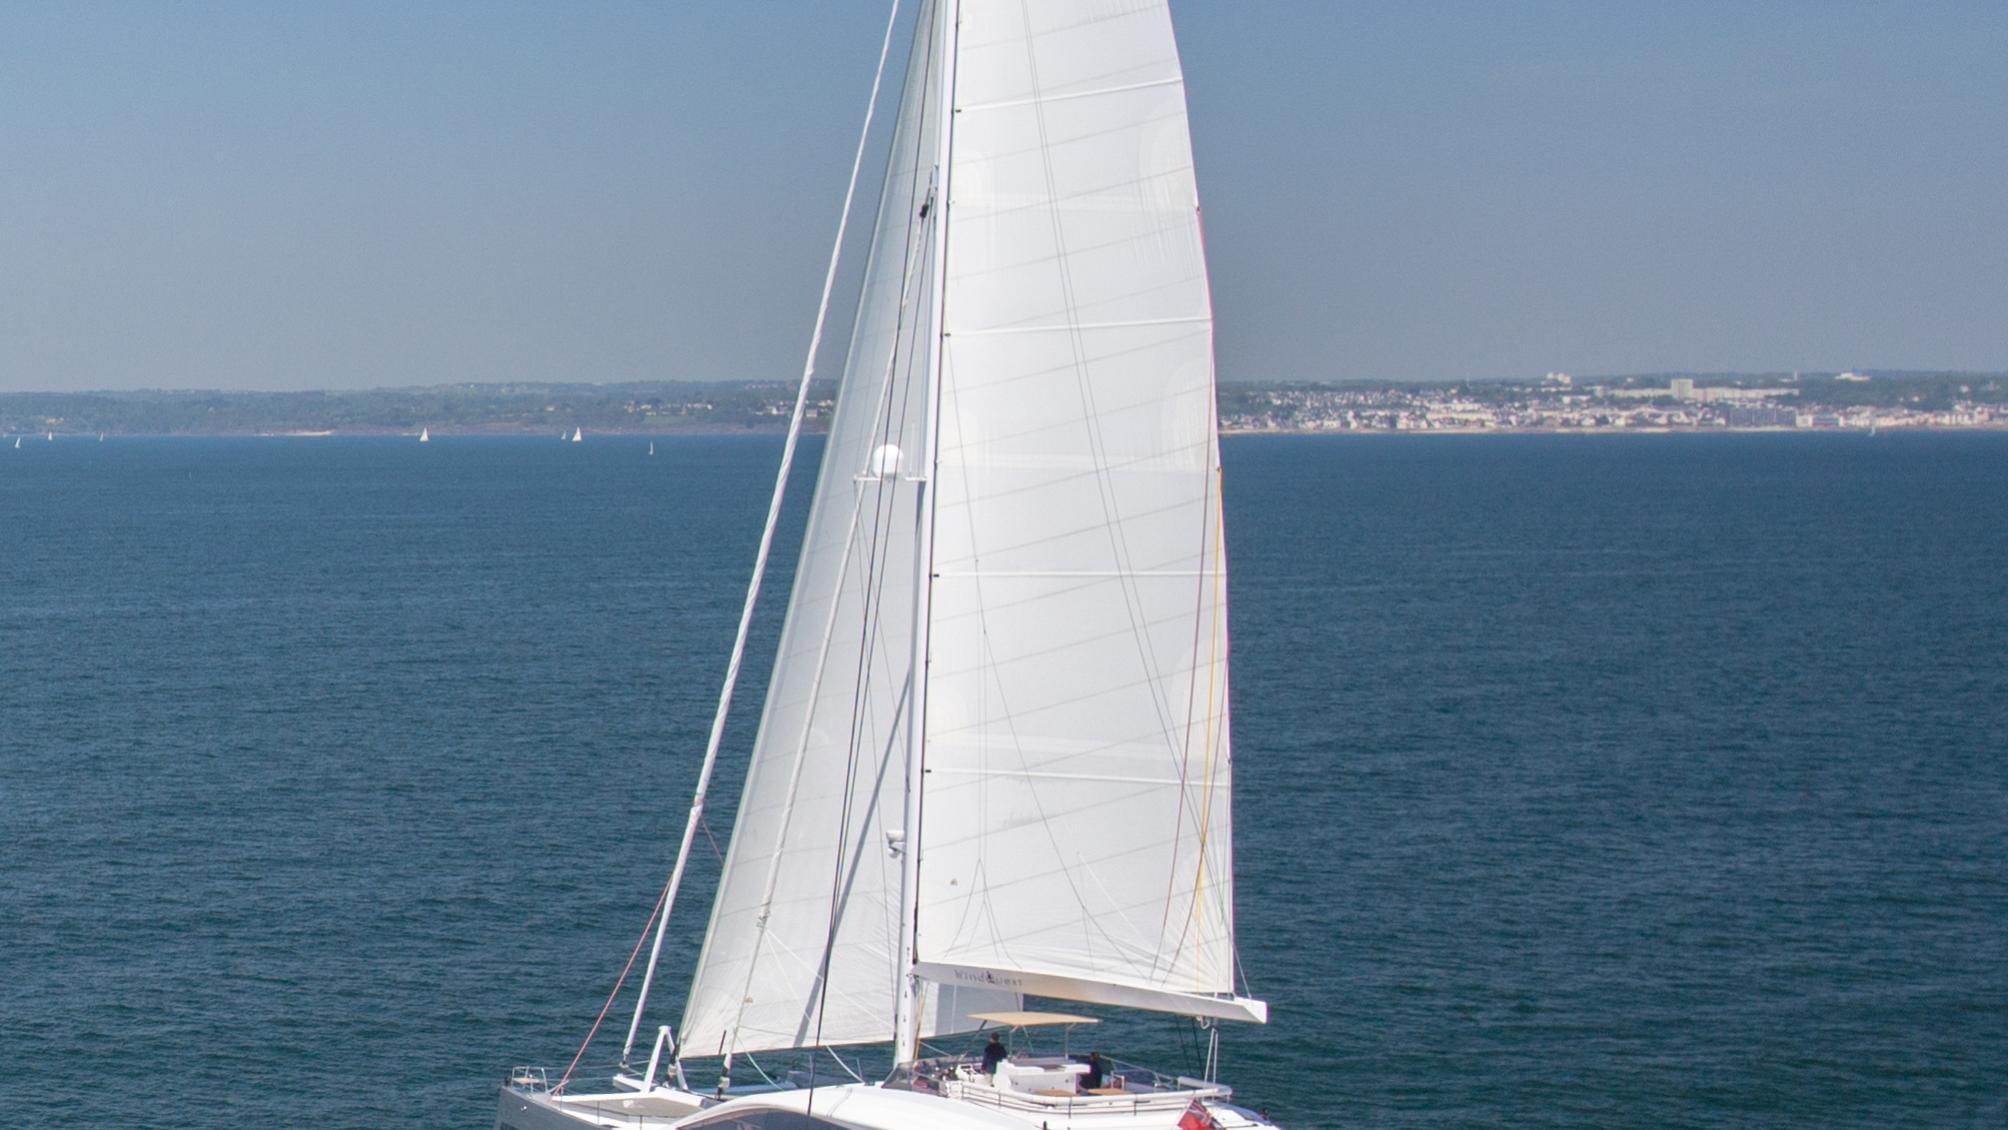 Windquest-catamaran-yacht-jfa-2014-26m-cruising-half-profile